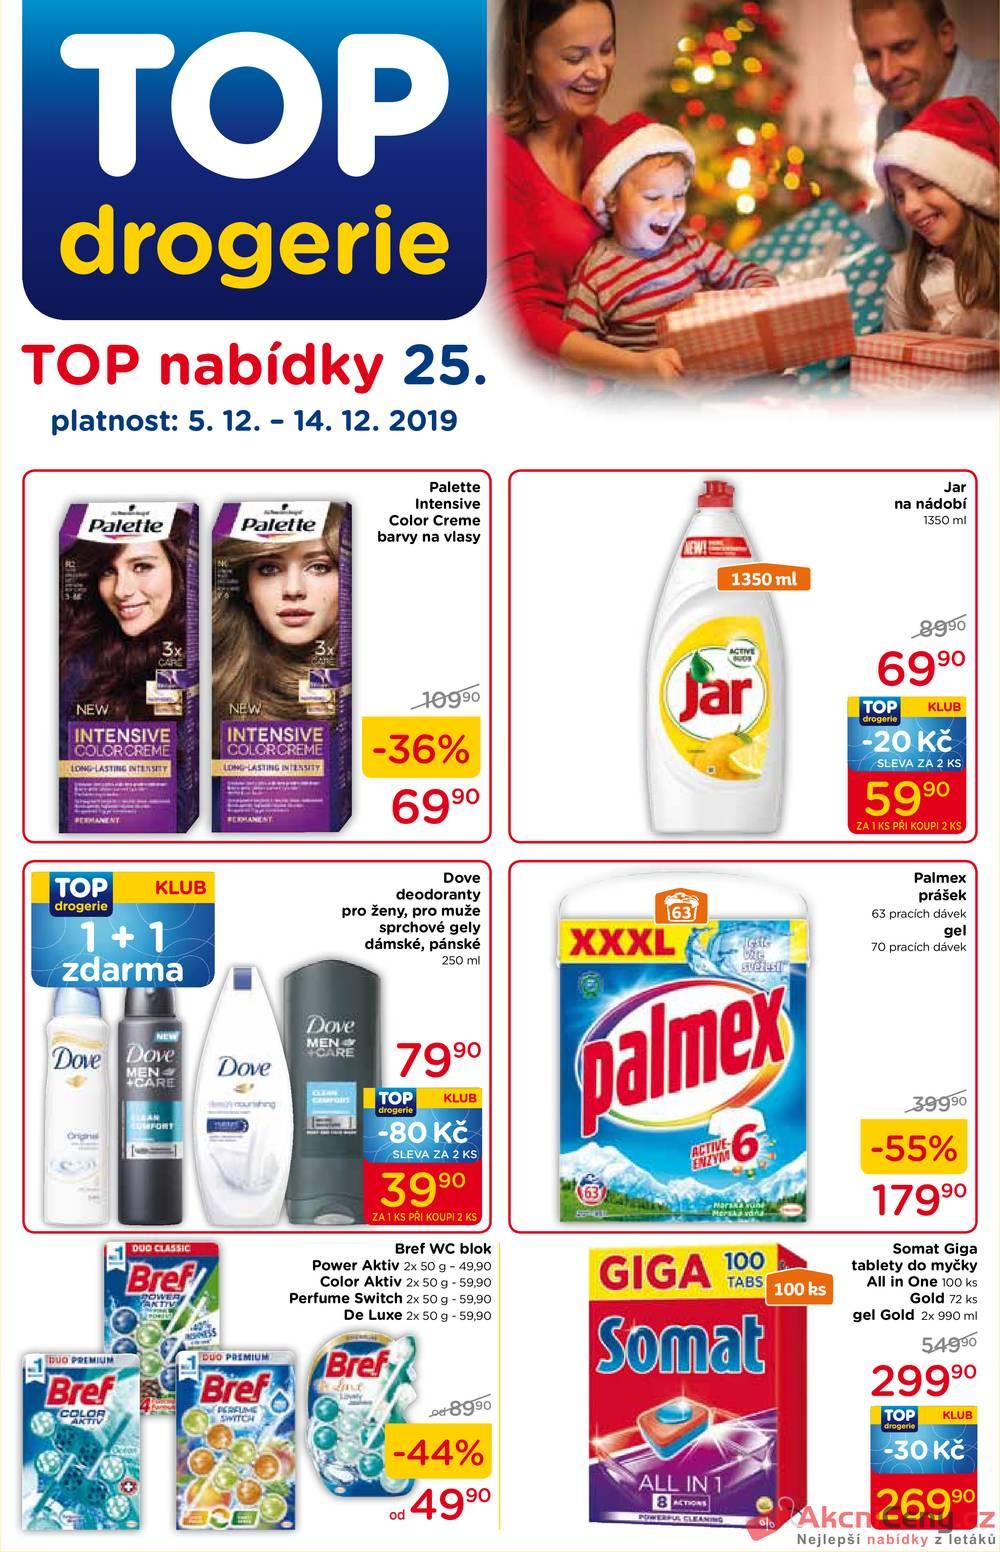 Leták TOP drogerie - TOP drogerie  od 5.12. do 14.12.2019 - strana 1